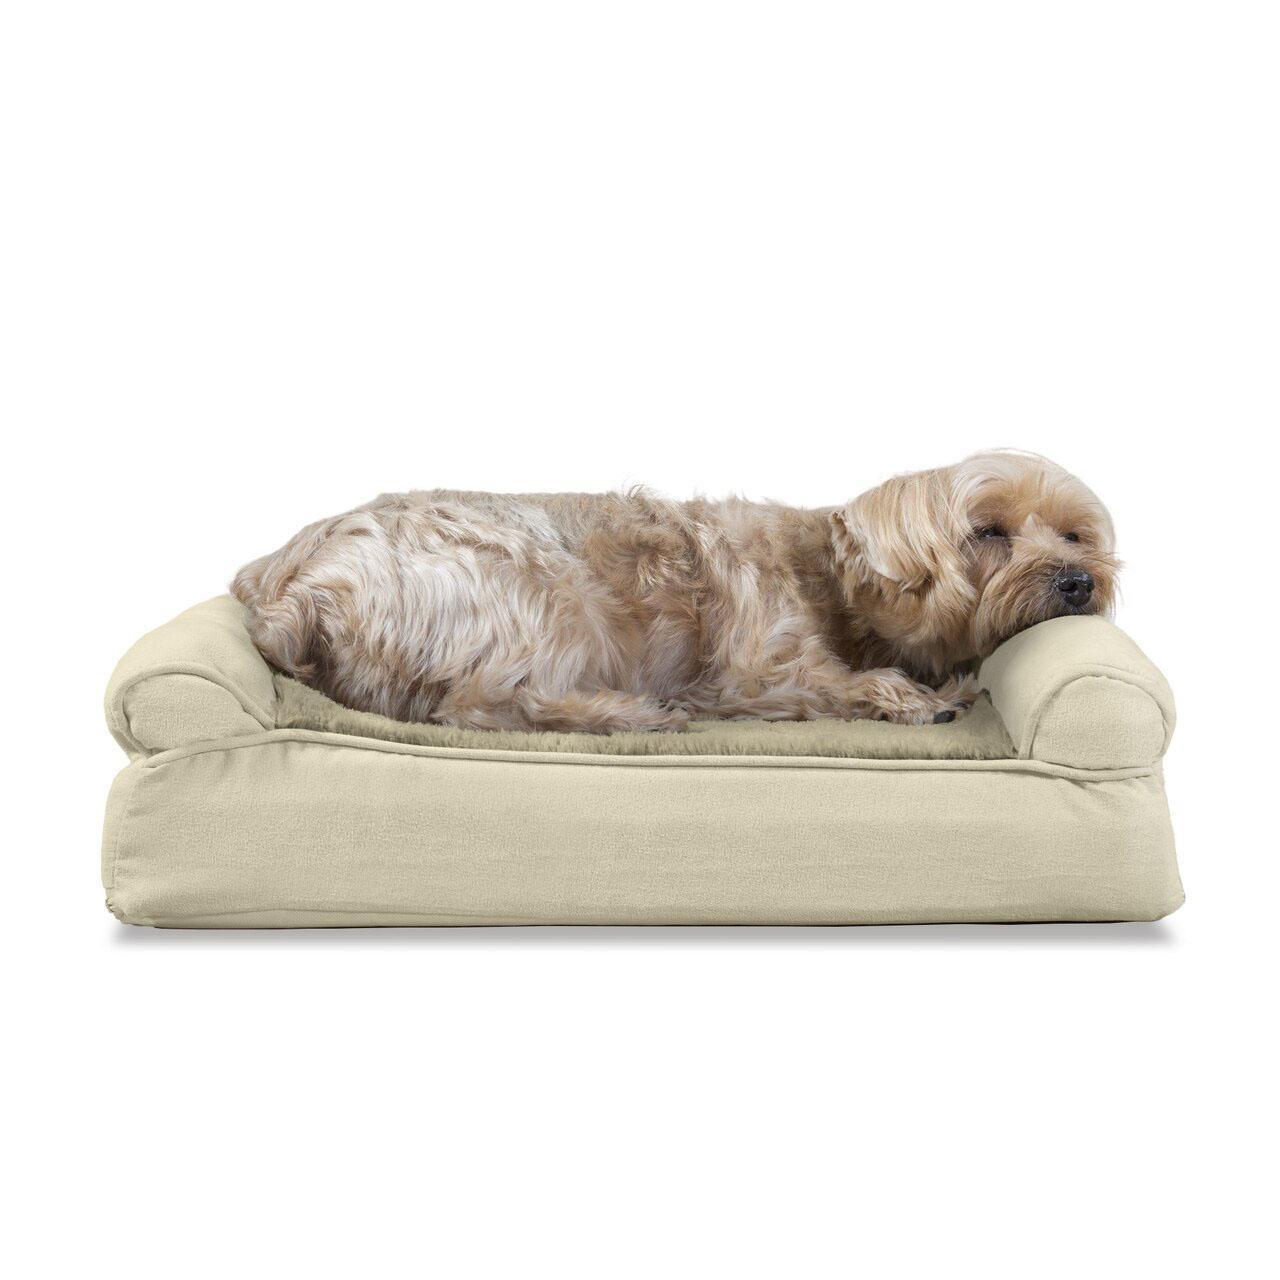 FurHaven Plush & Suede Memory Top Sofa Pet Bed - Clay